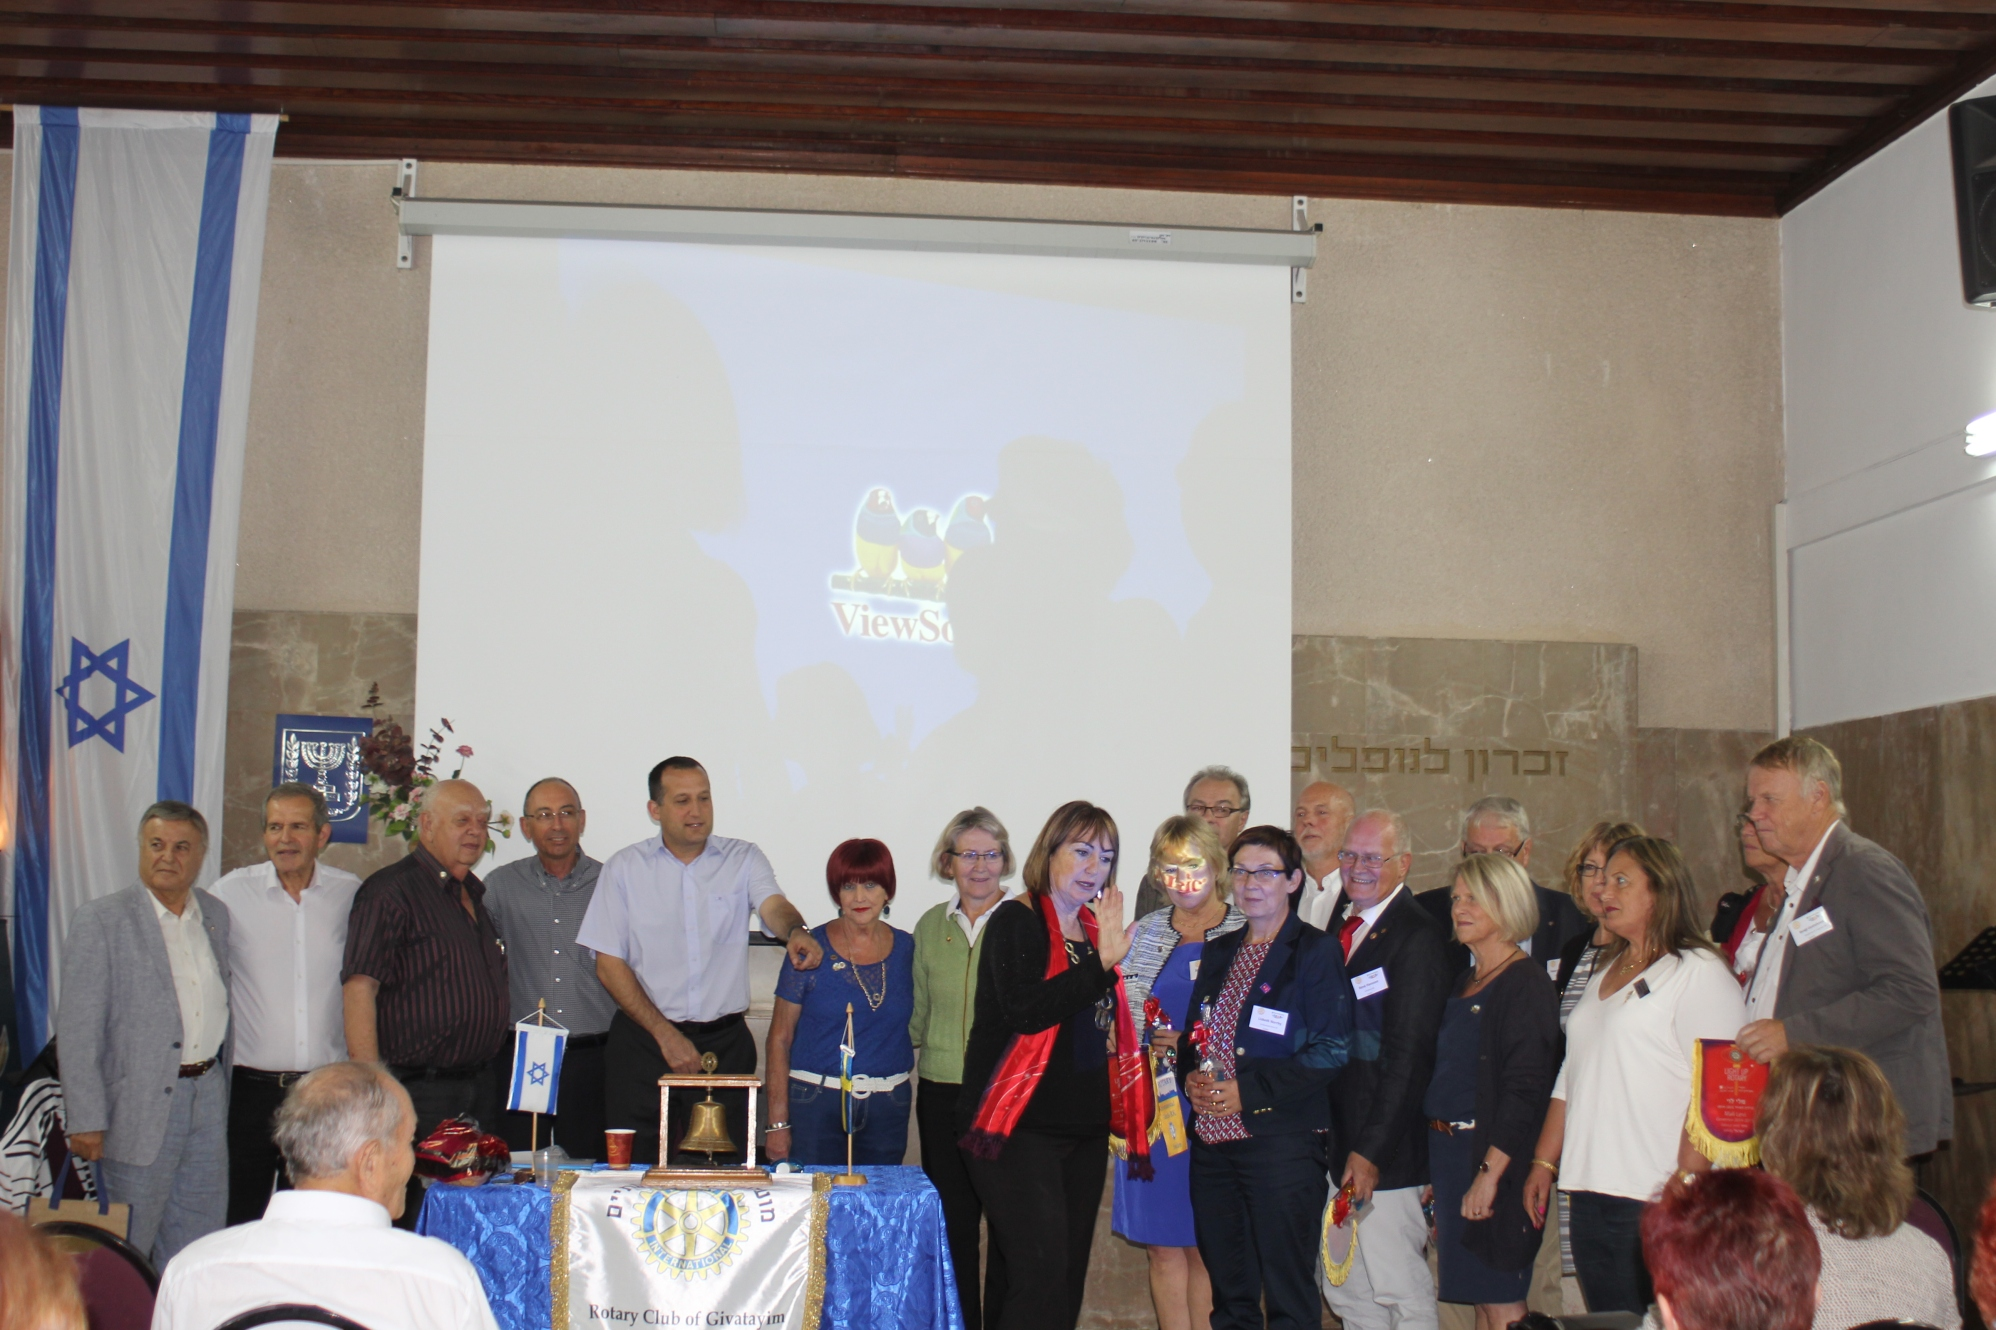 The Swedish team meeting their Israeli hosts. Photo courtesy of Ephraim Pri-Har